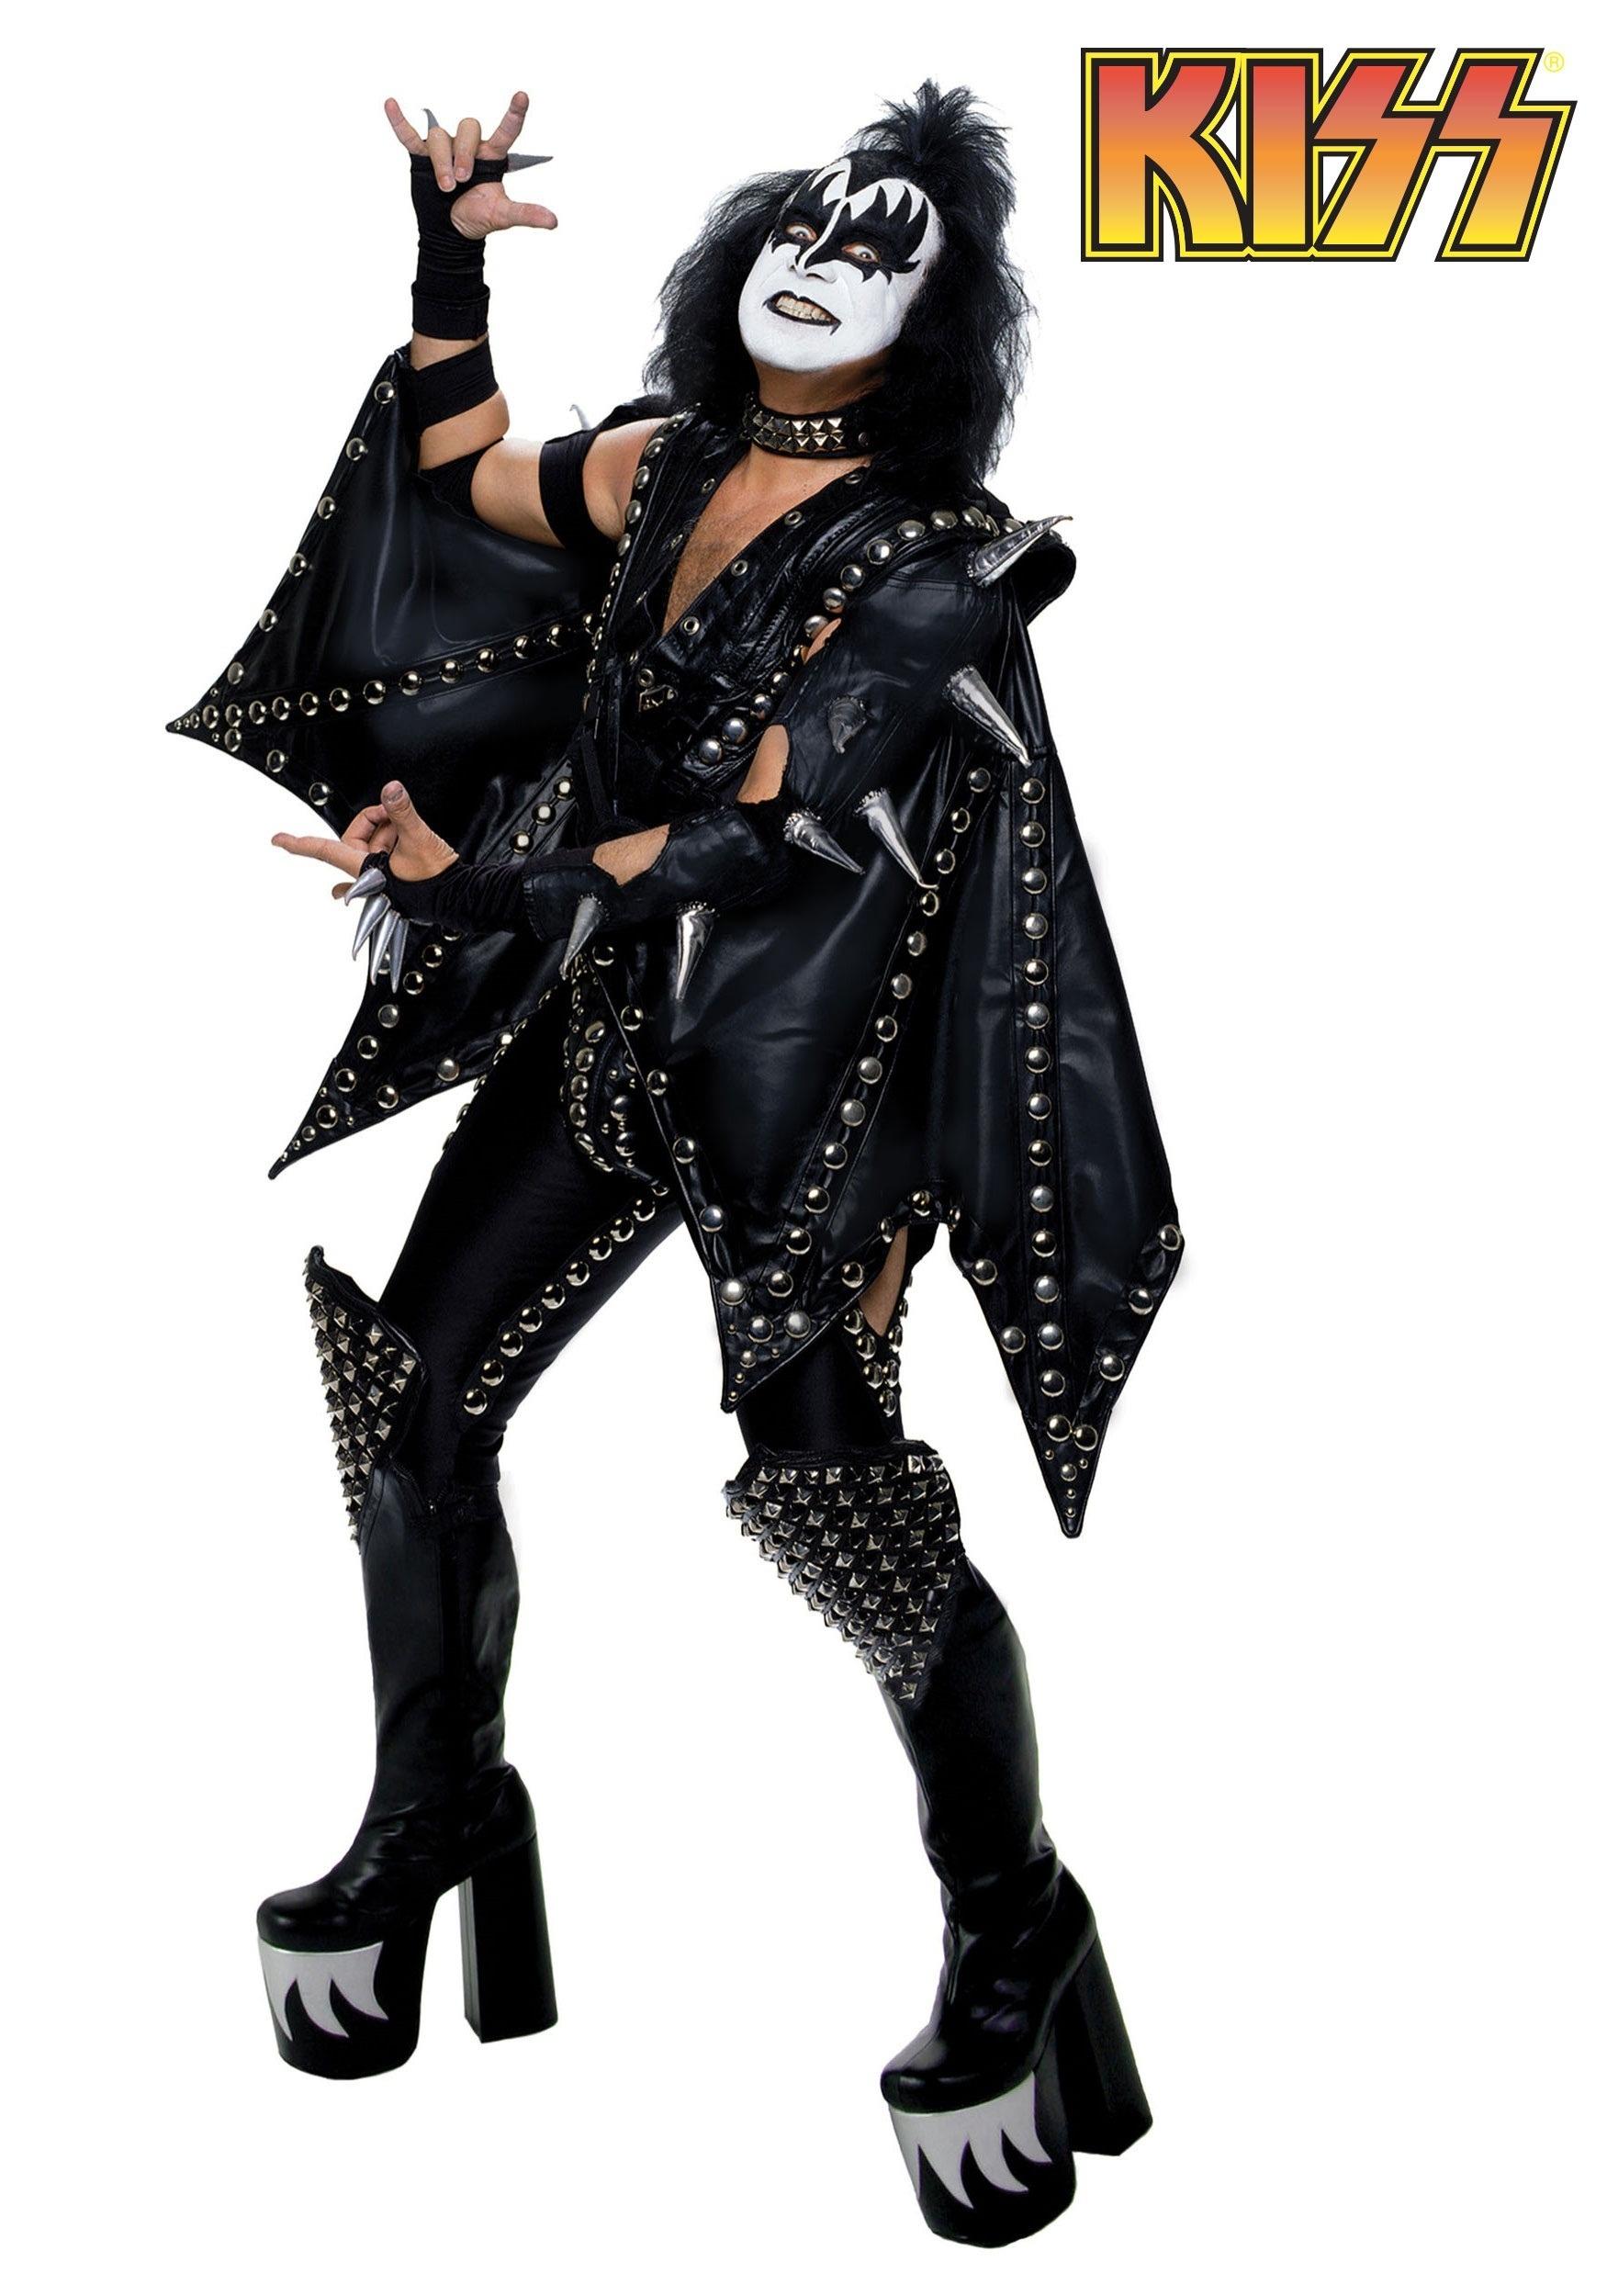 Kiss Costumes - KISS Band Halloween Costume Paul, Gene Simmons Boots